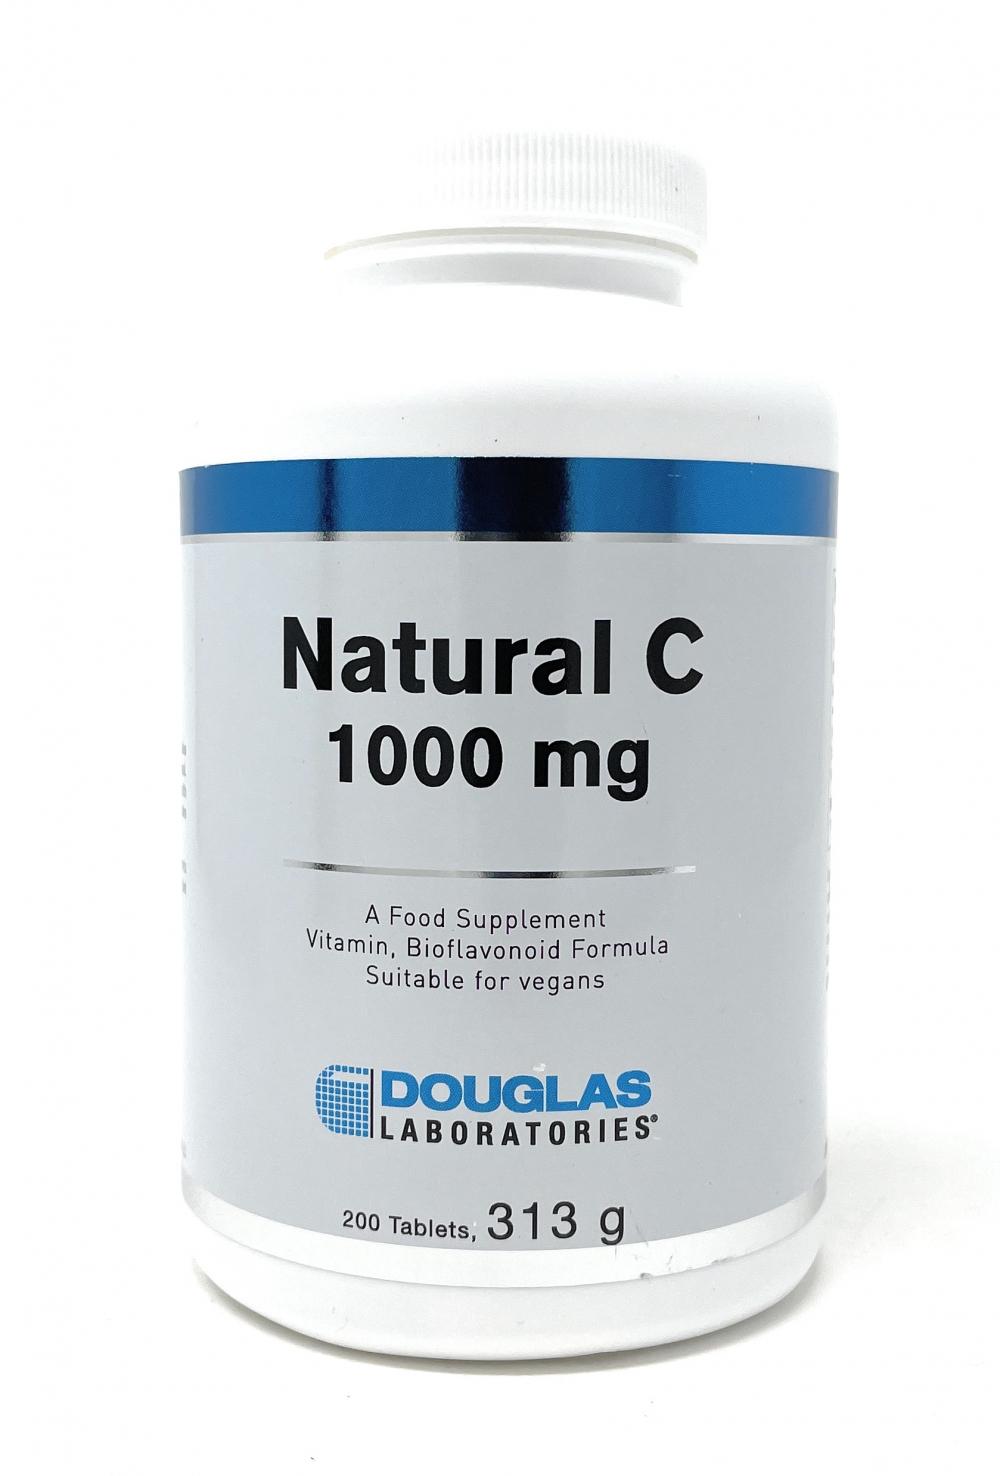 Douglas Laboratories Europe Natural C 1000 mg 200 Tabletten (313g)